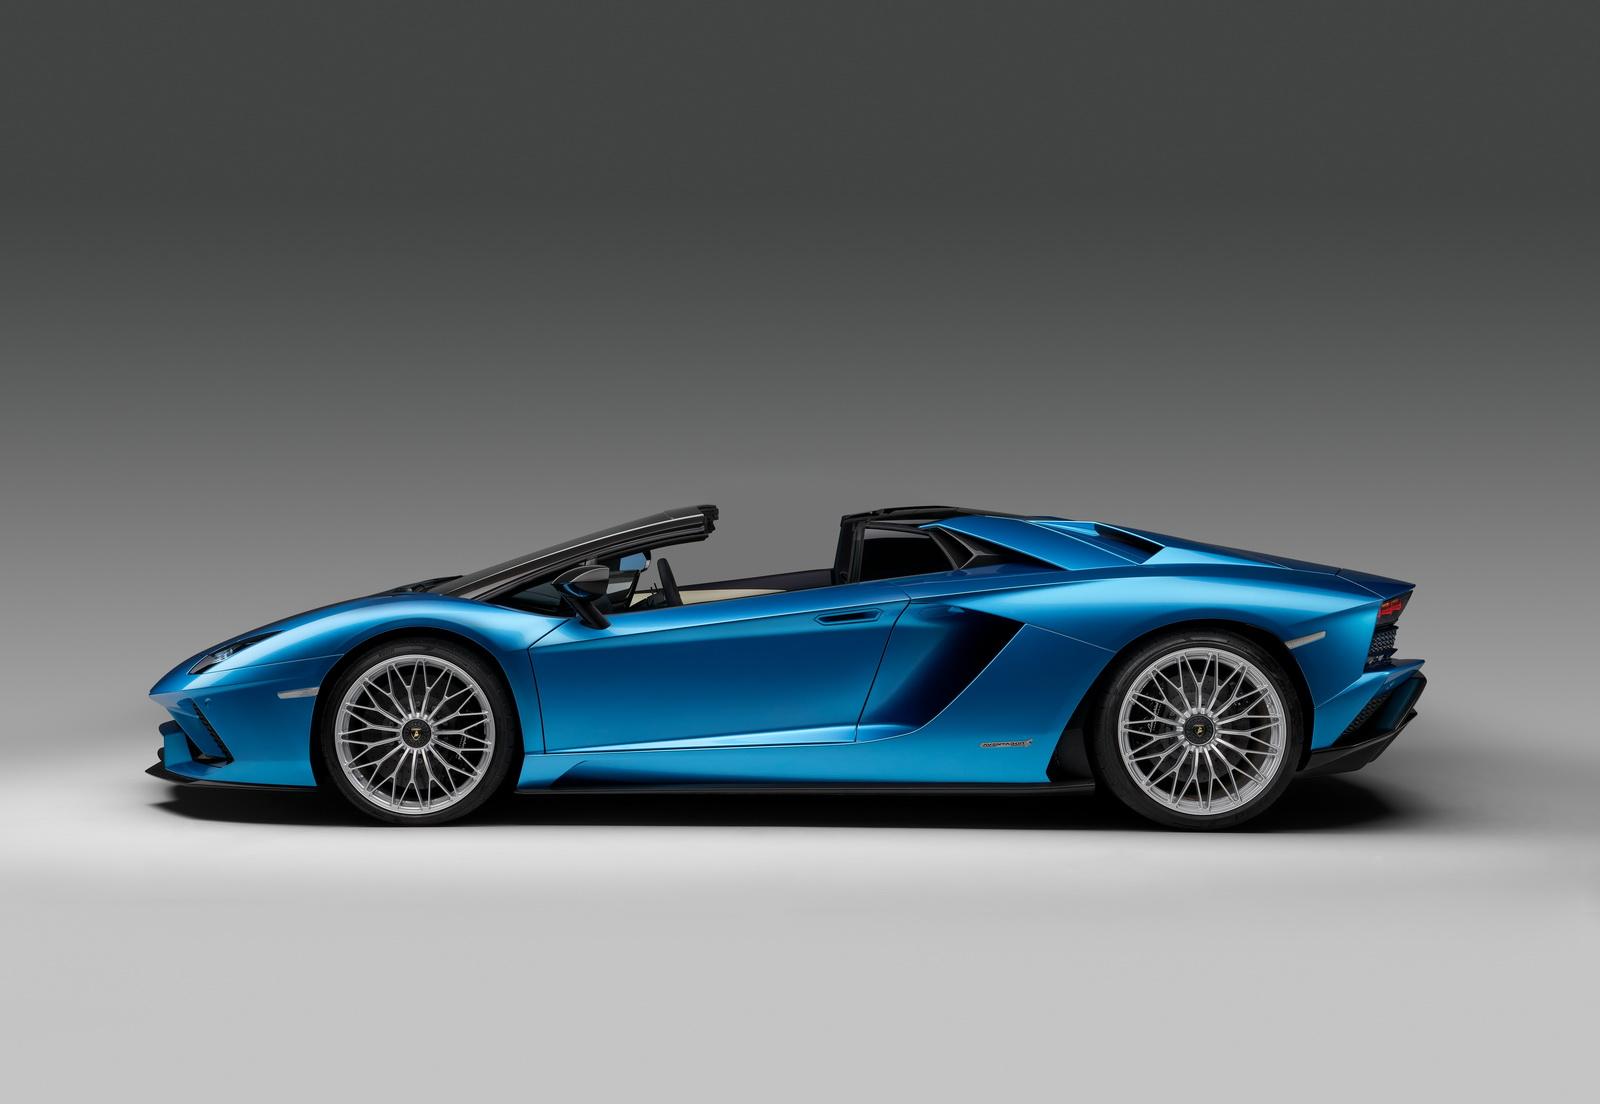 2018_Lamborghini_Aventador_S_Roadster_03